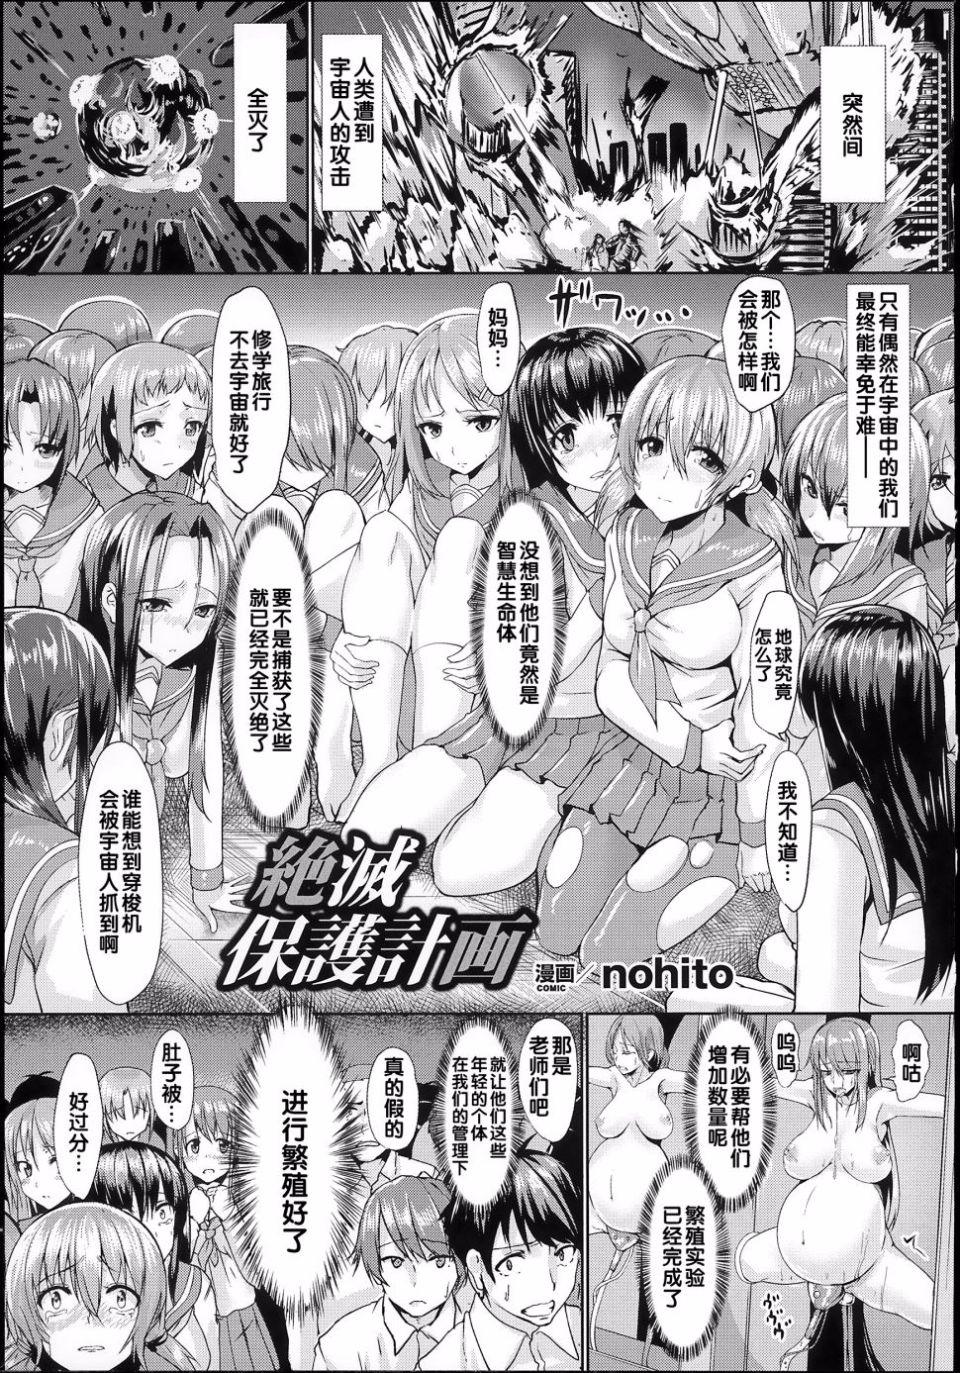 [nohito] 絶滅保護計畫 - 情色卡漫 -